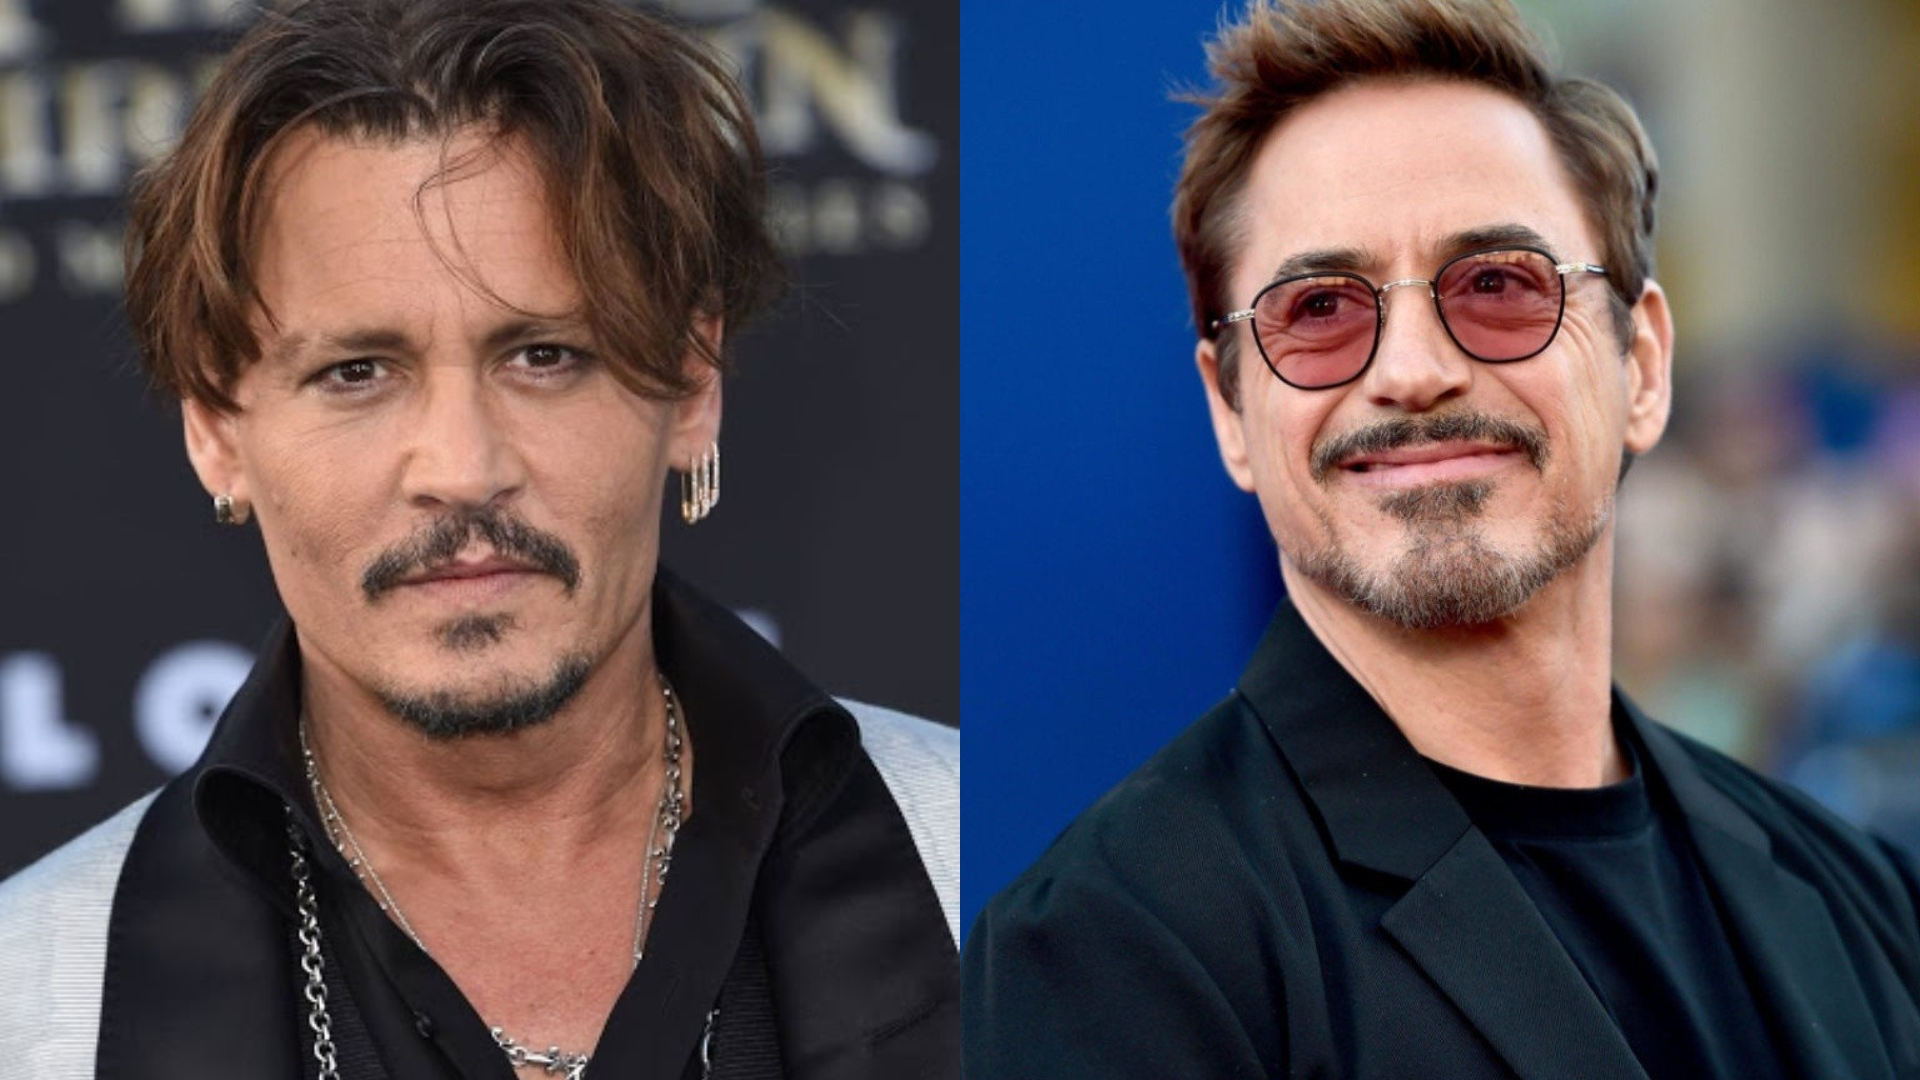 Robert-Downey-Jr-ohnny-Depp